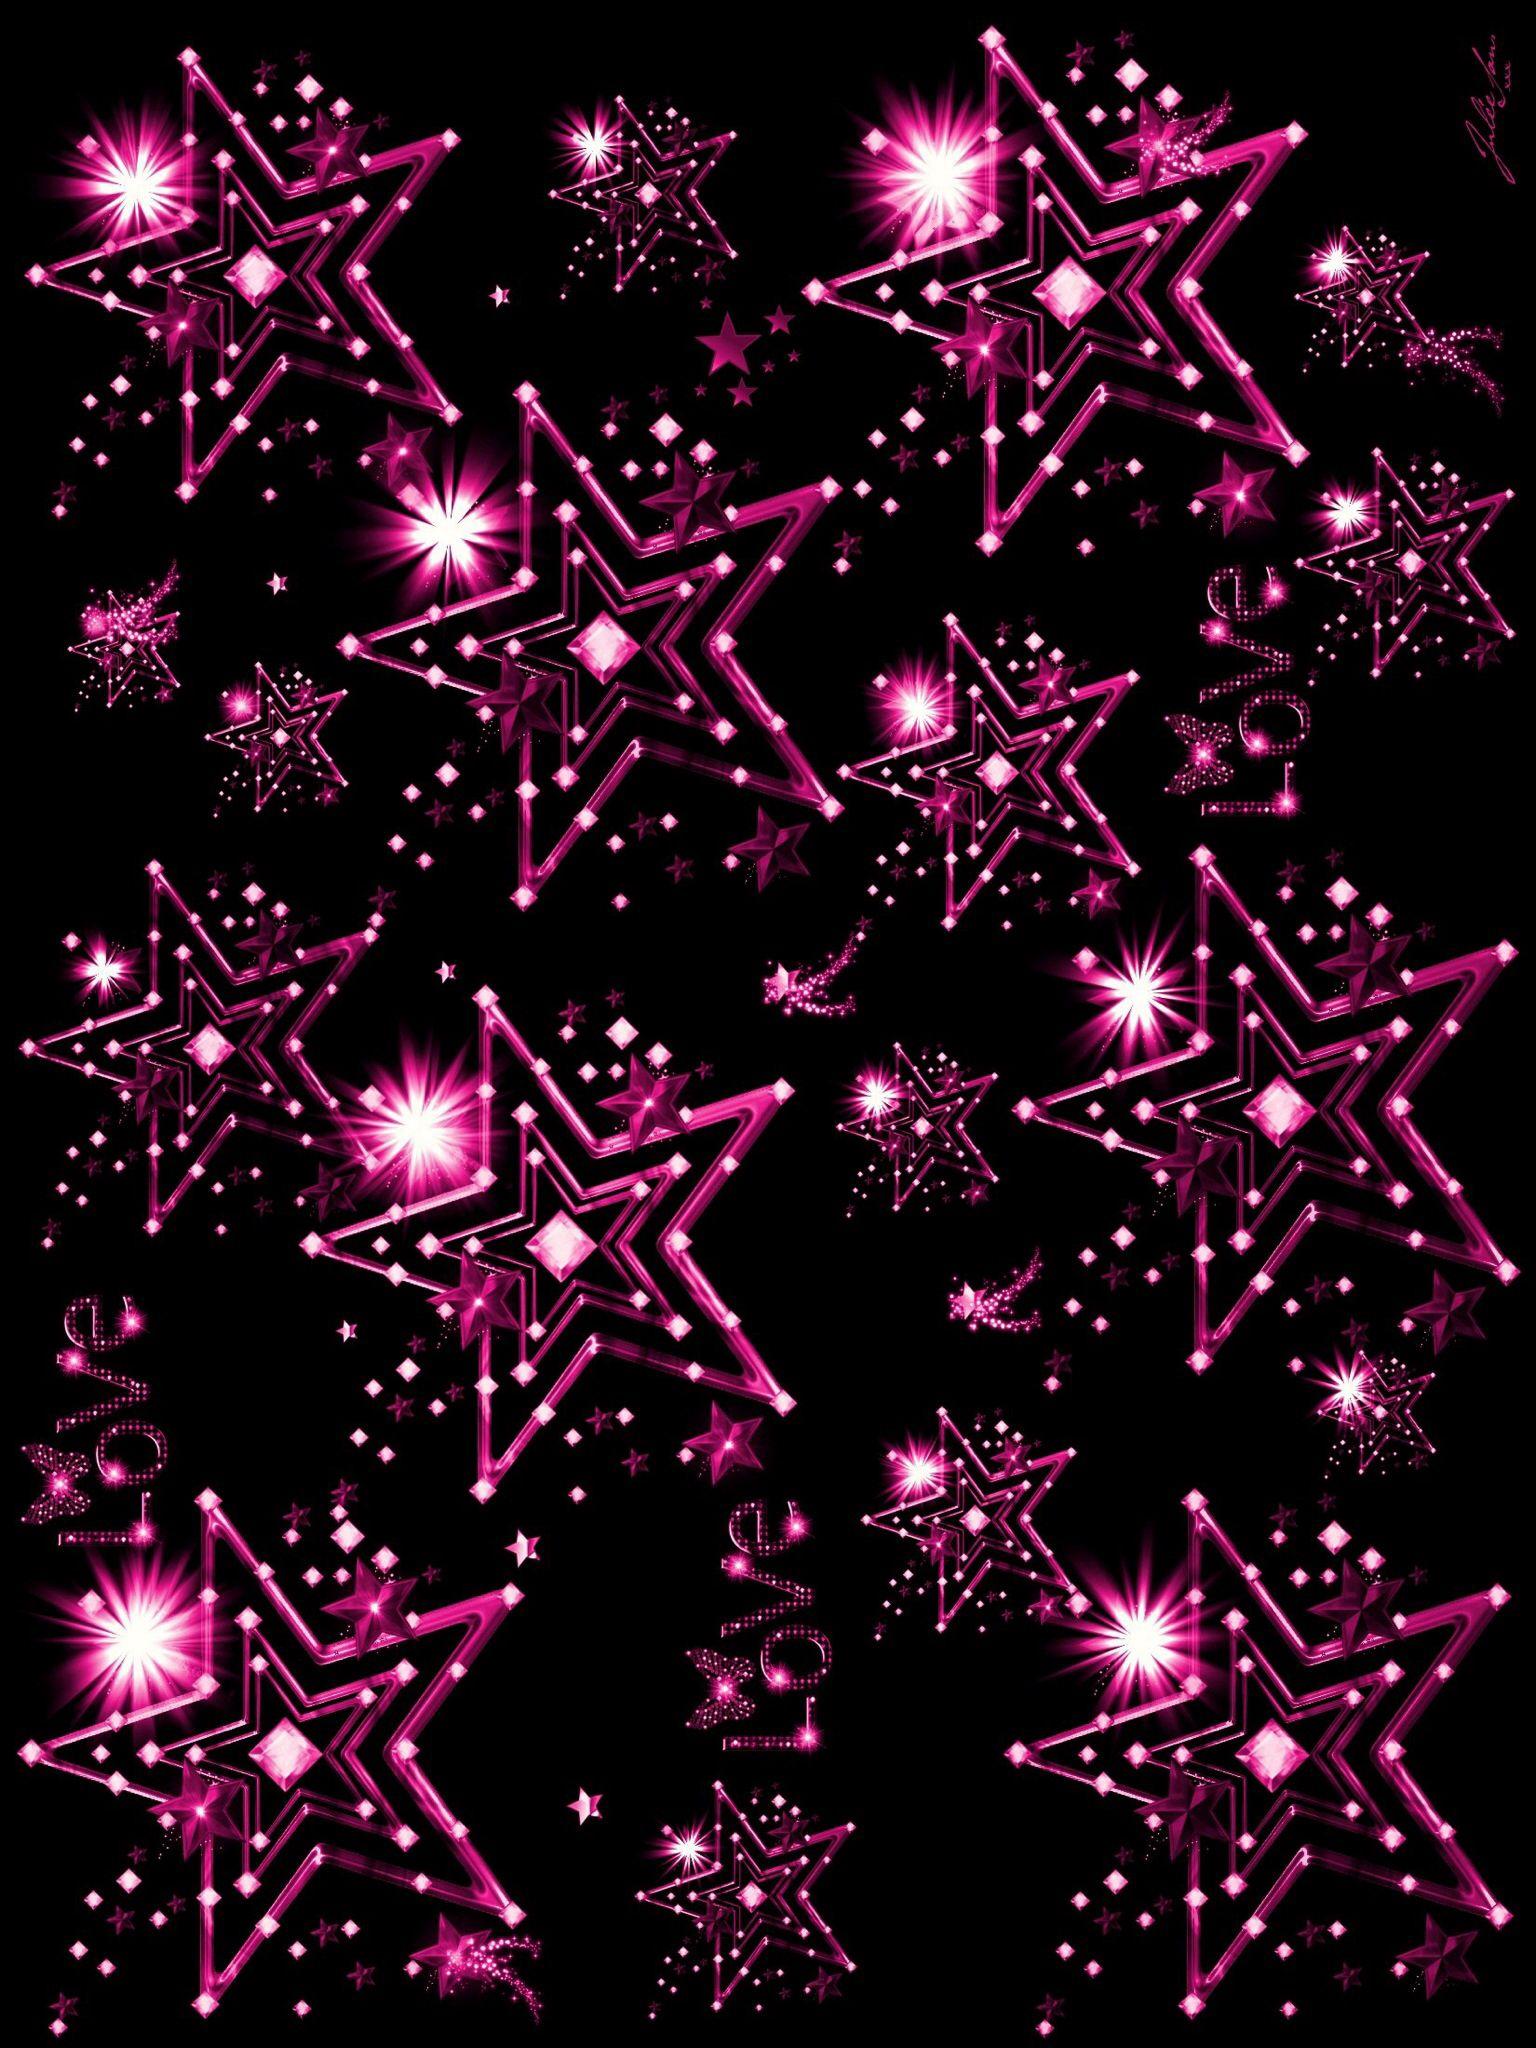 Sparkly Pink Stars Wallpaper Bling Wallpaper Phone Wallpaper